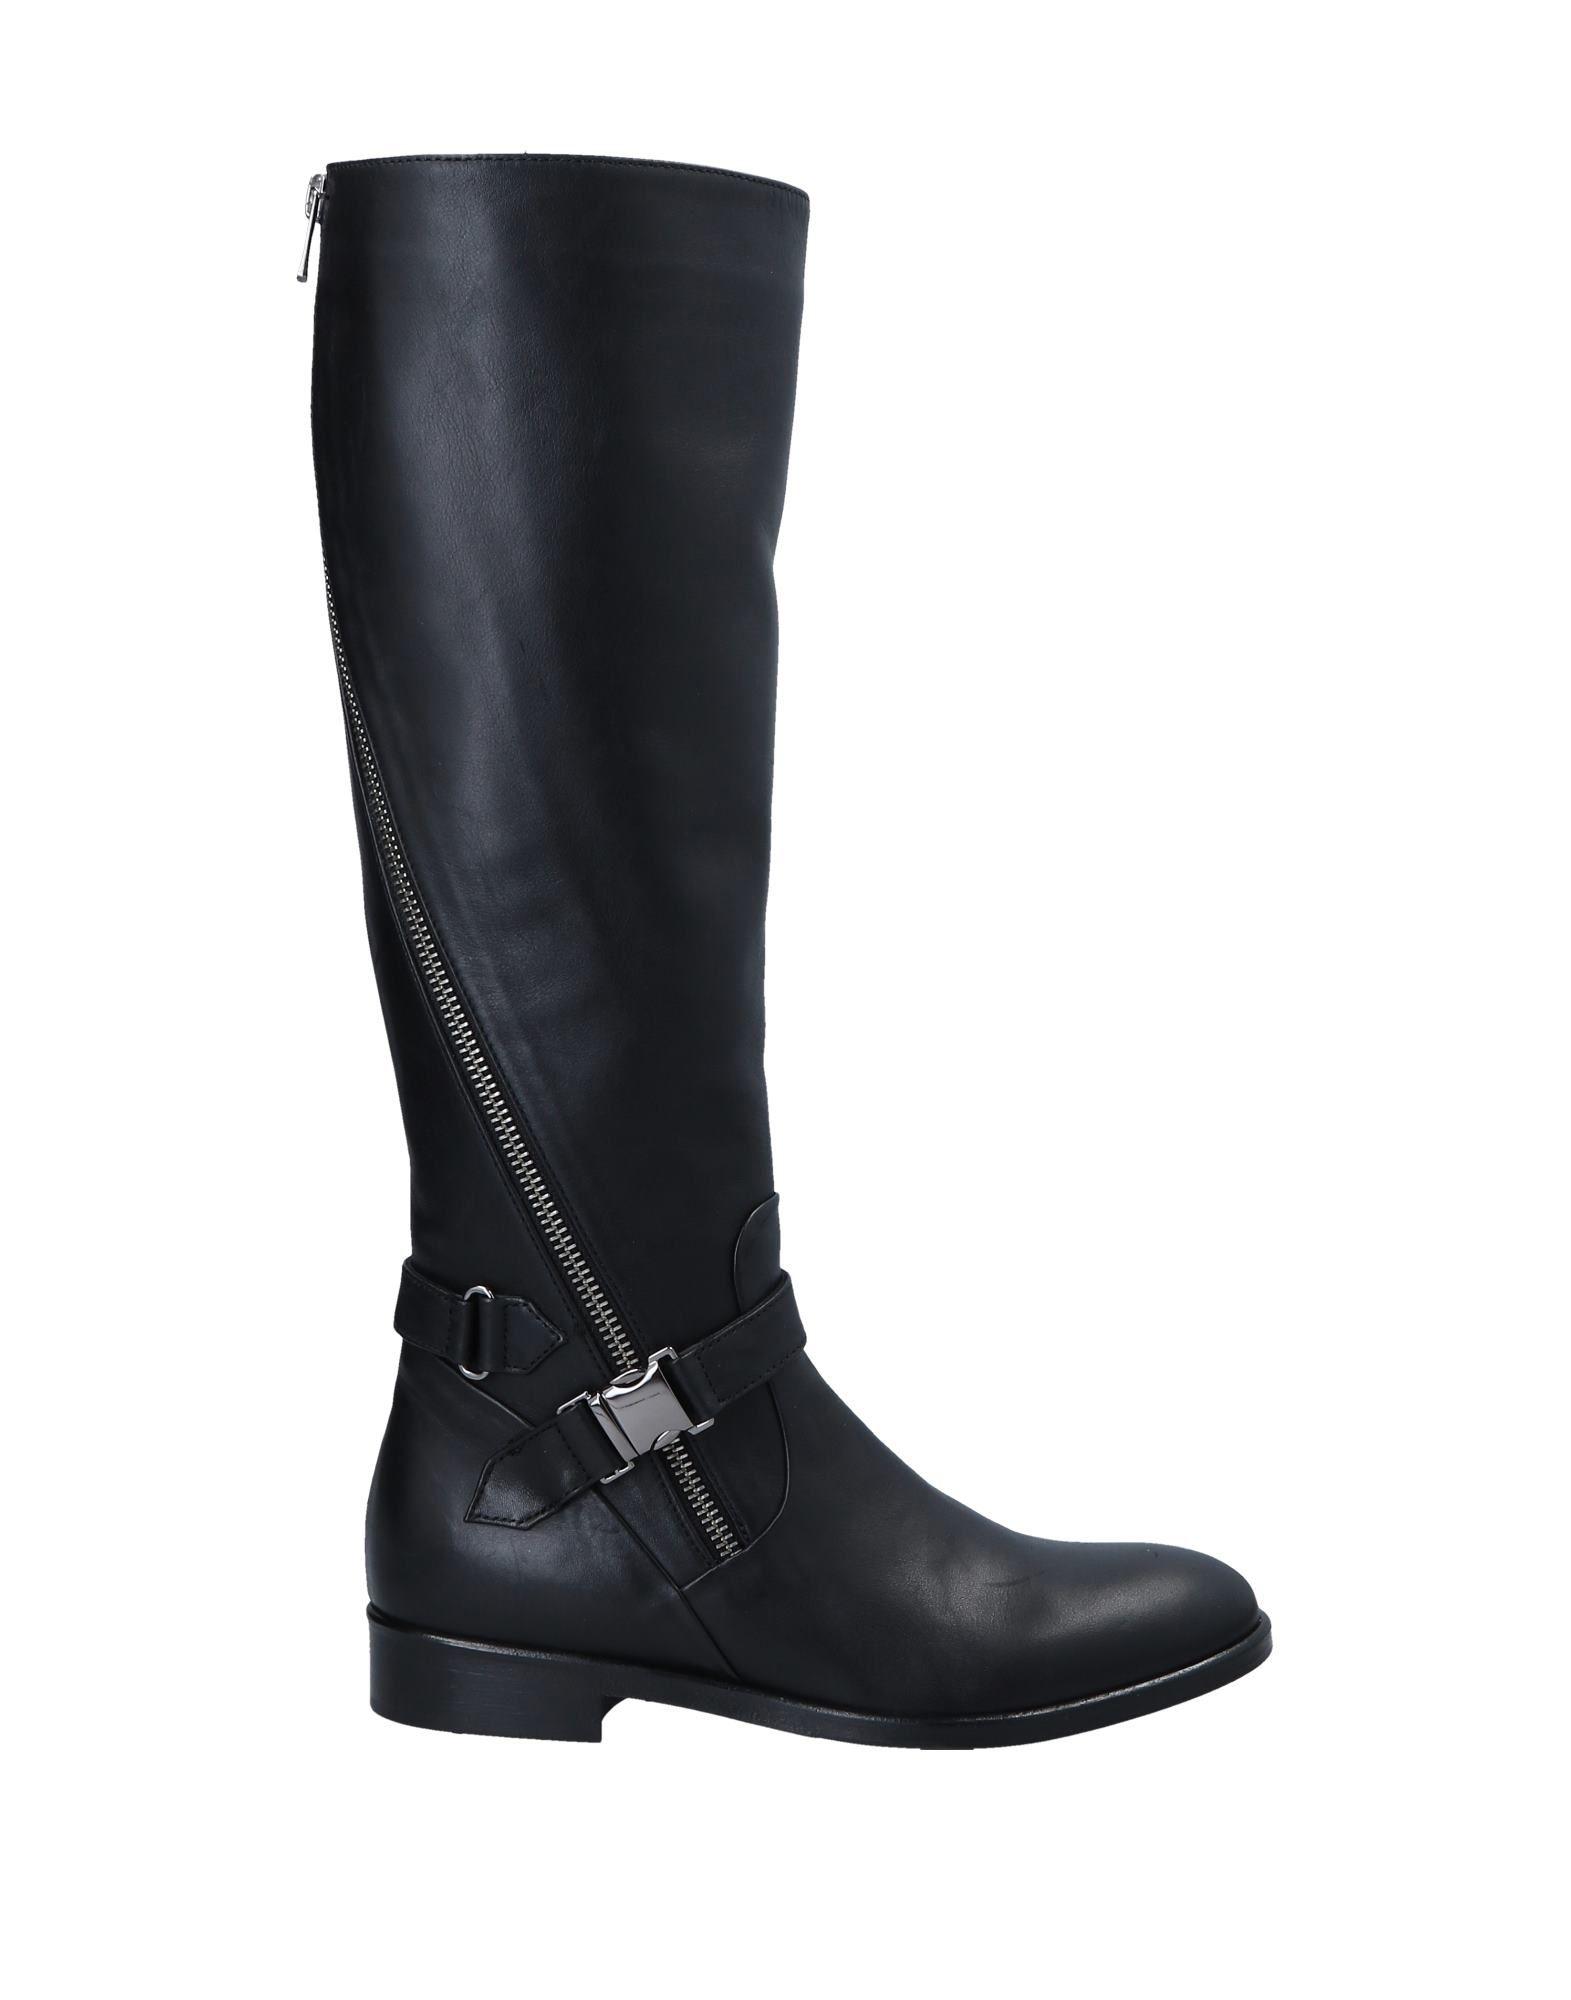 Peter Flowers Boots - Women Peter Flowers Australia Boots online on  Australia Flowers - 11544579HG b9218a